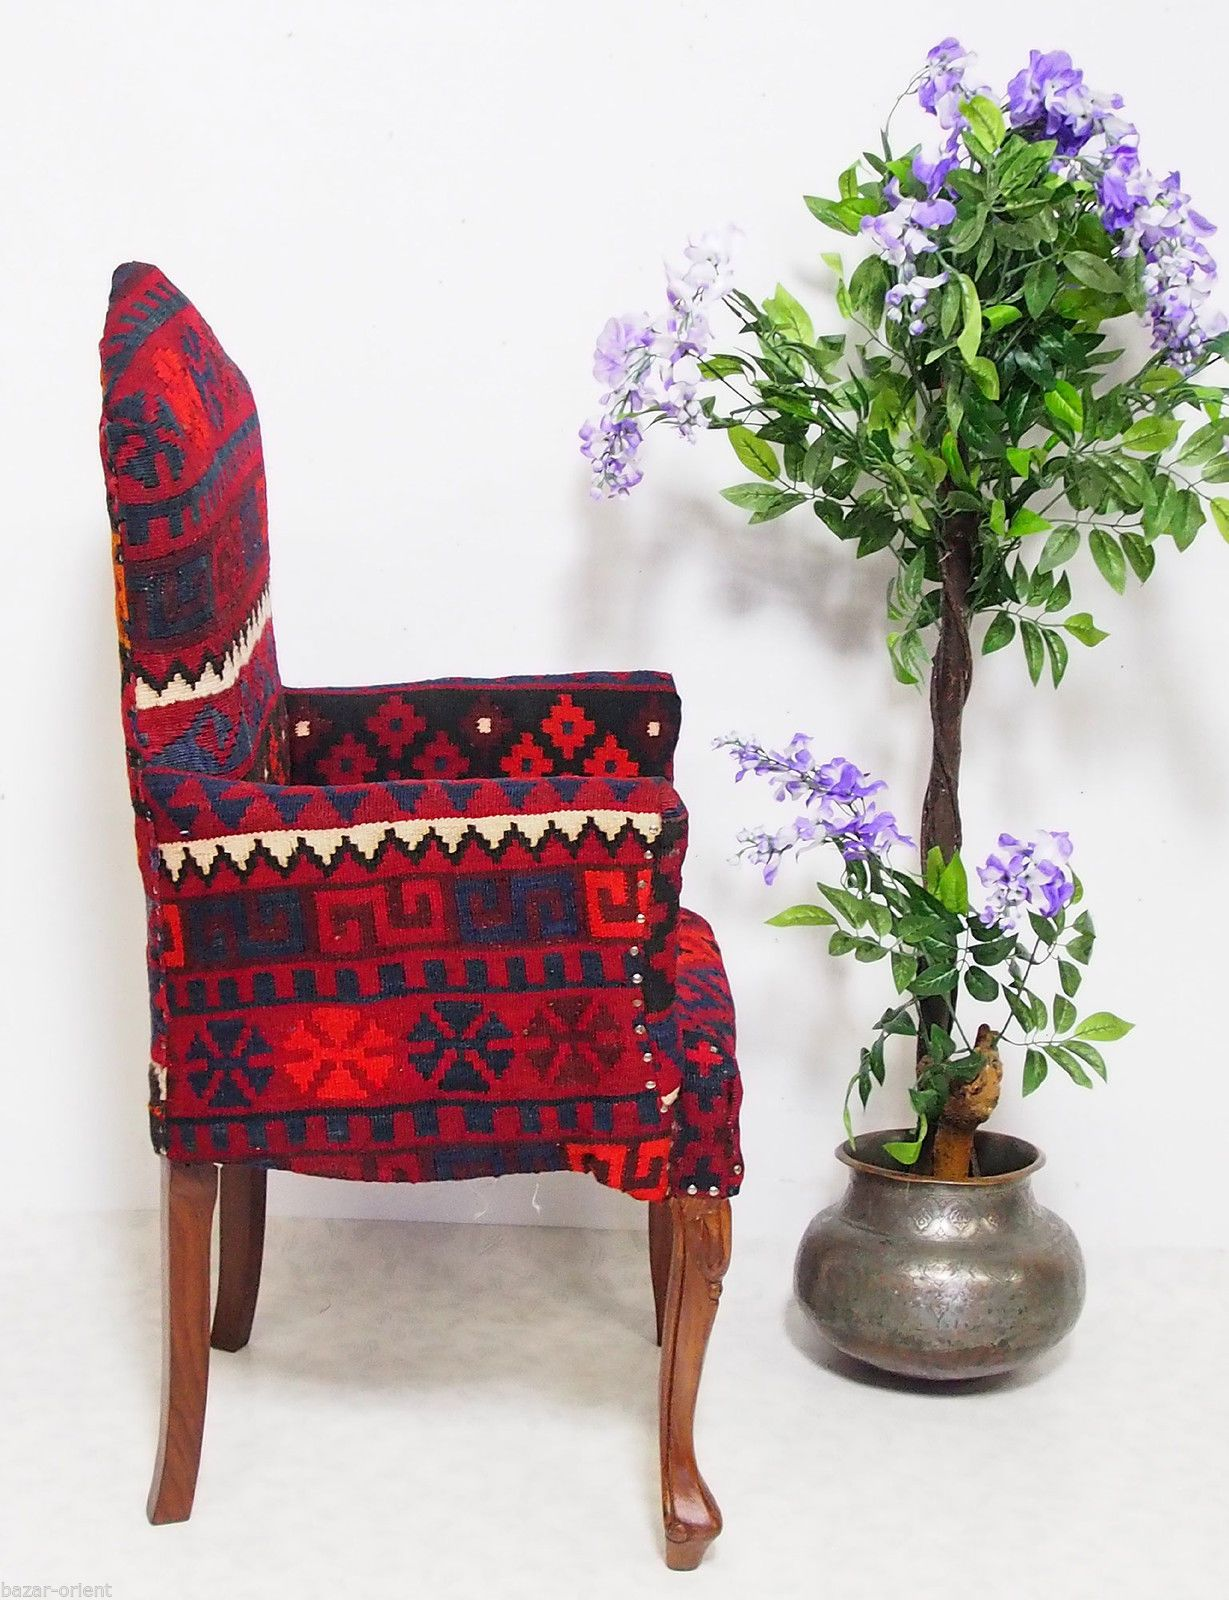 orient kelim stuhl Polsterstuhl Sessel sofa couch kilim chair from